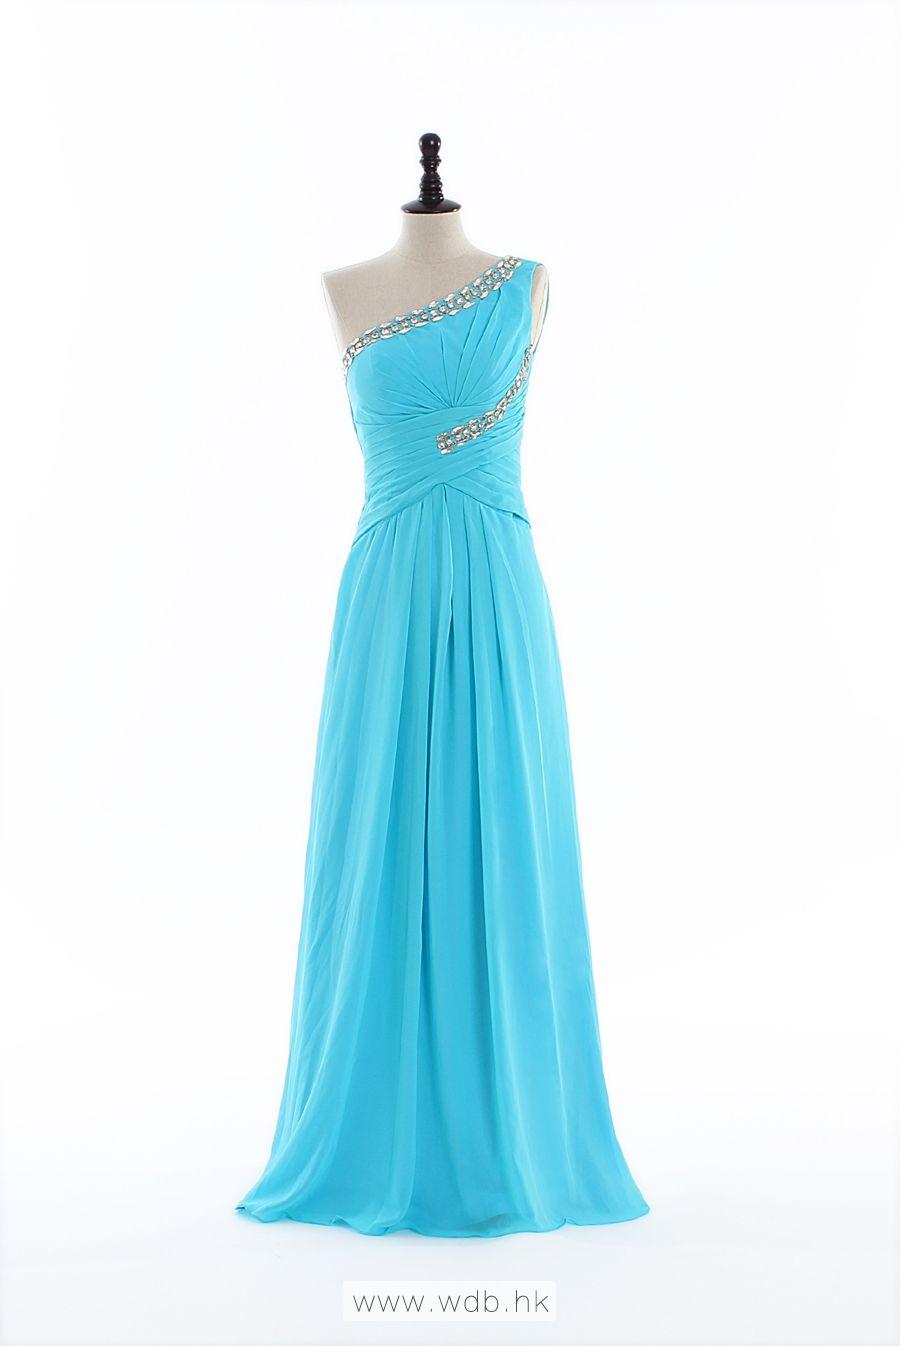 Shiny Single Shoulder Chiffon Dress $138.98\